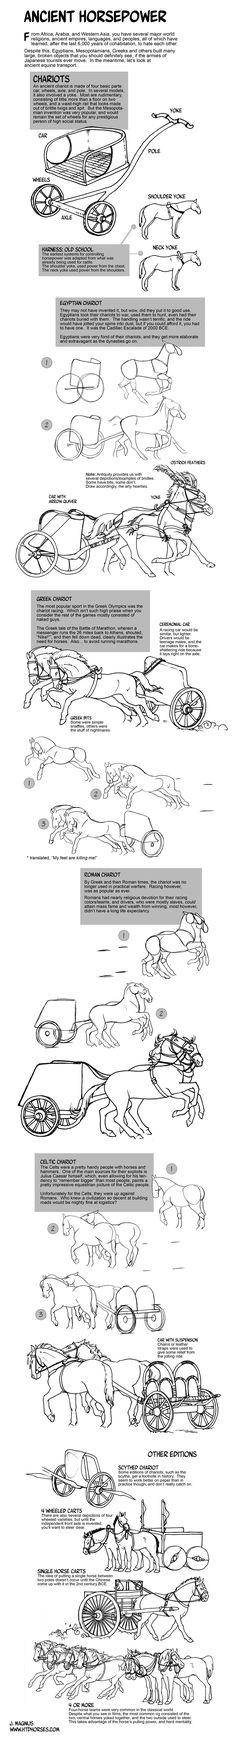 Drawing Ancient Chariots by sketcherjak.deviantart.com on @deviantART